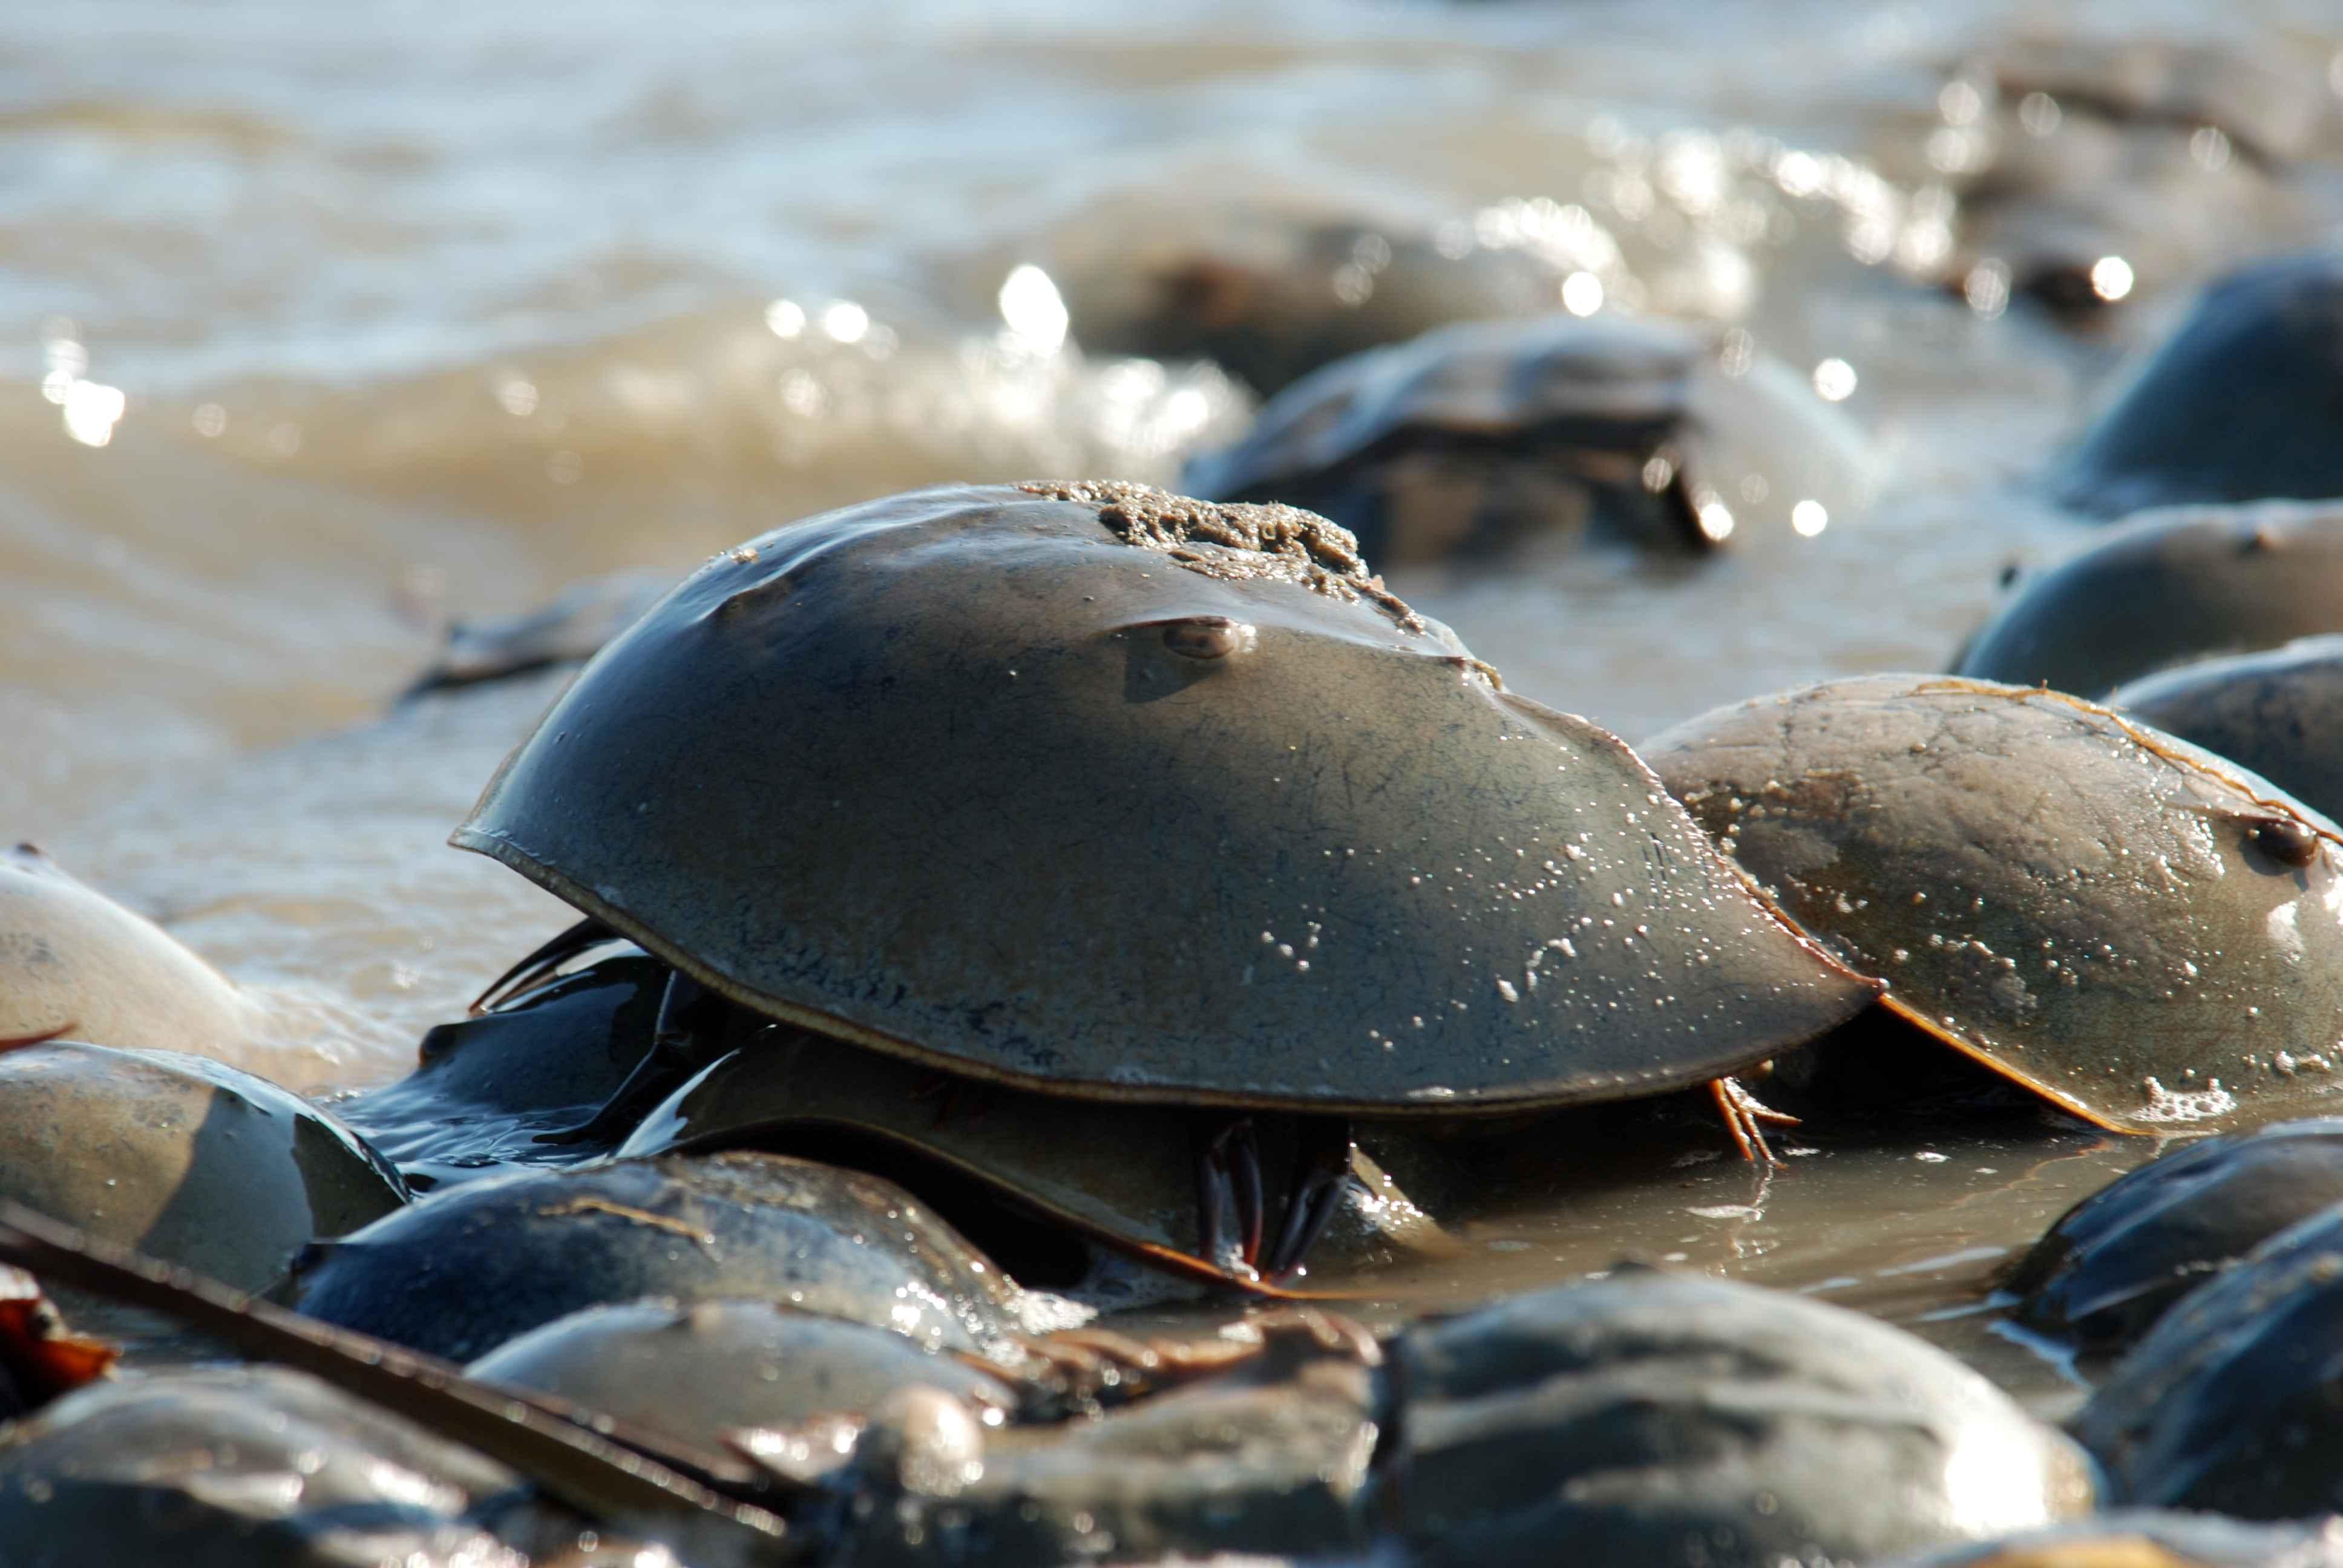 Limulus_polyphemus_horseshue_crab_on_coast.jpg